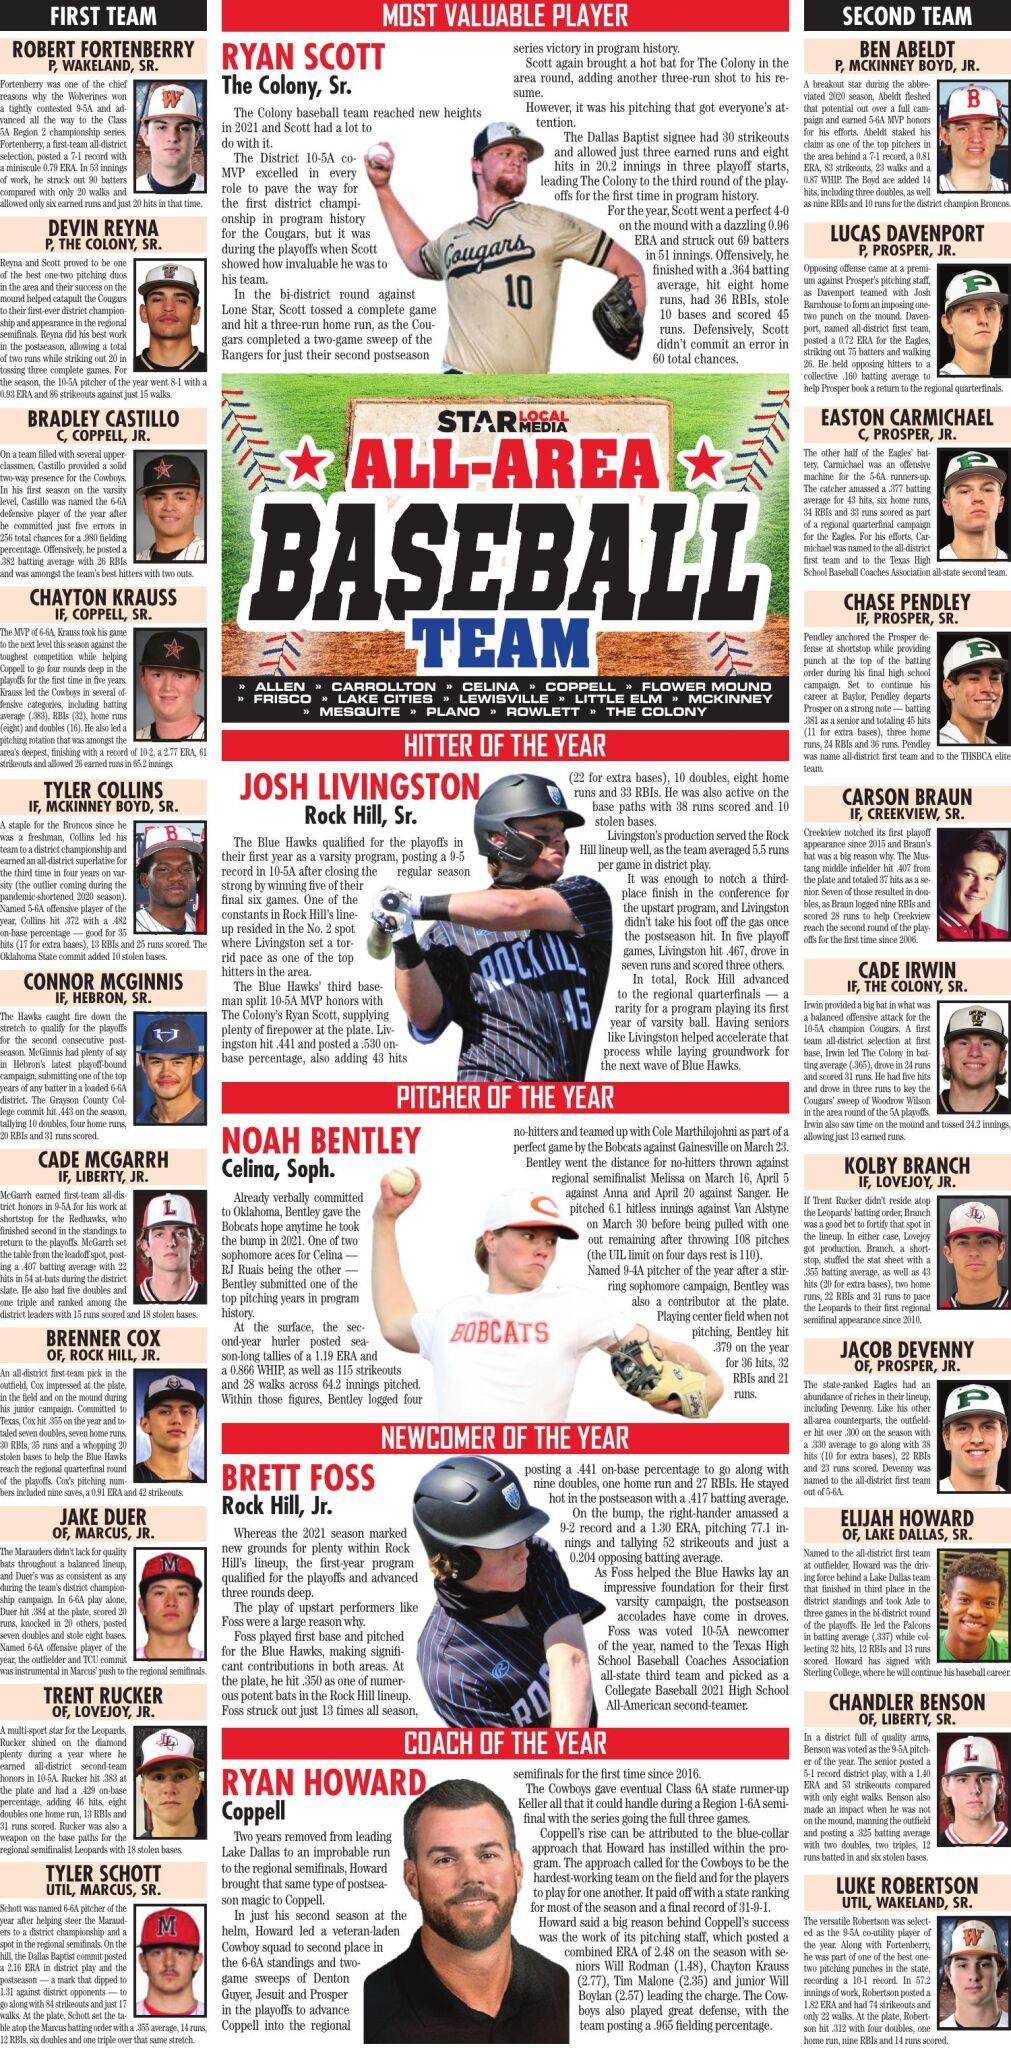 2021 Star Local Media All-Area Baseball